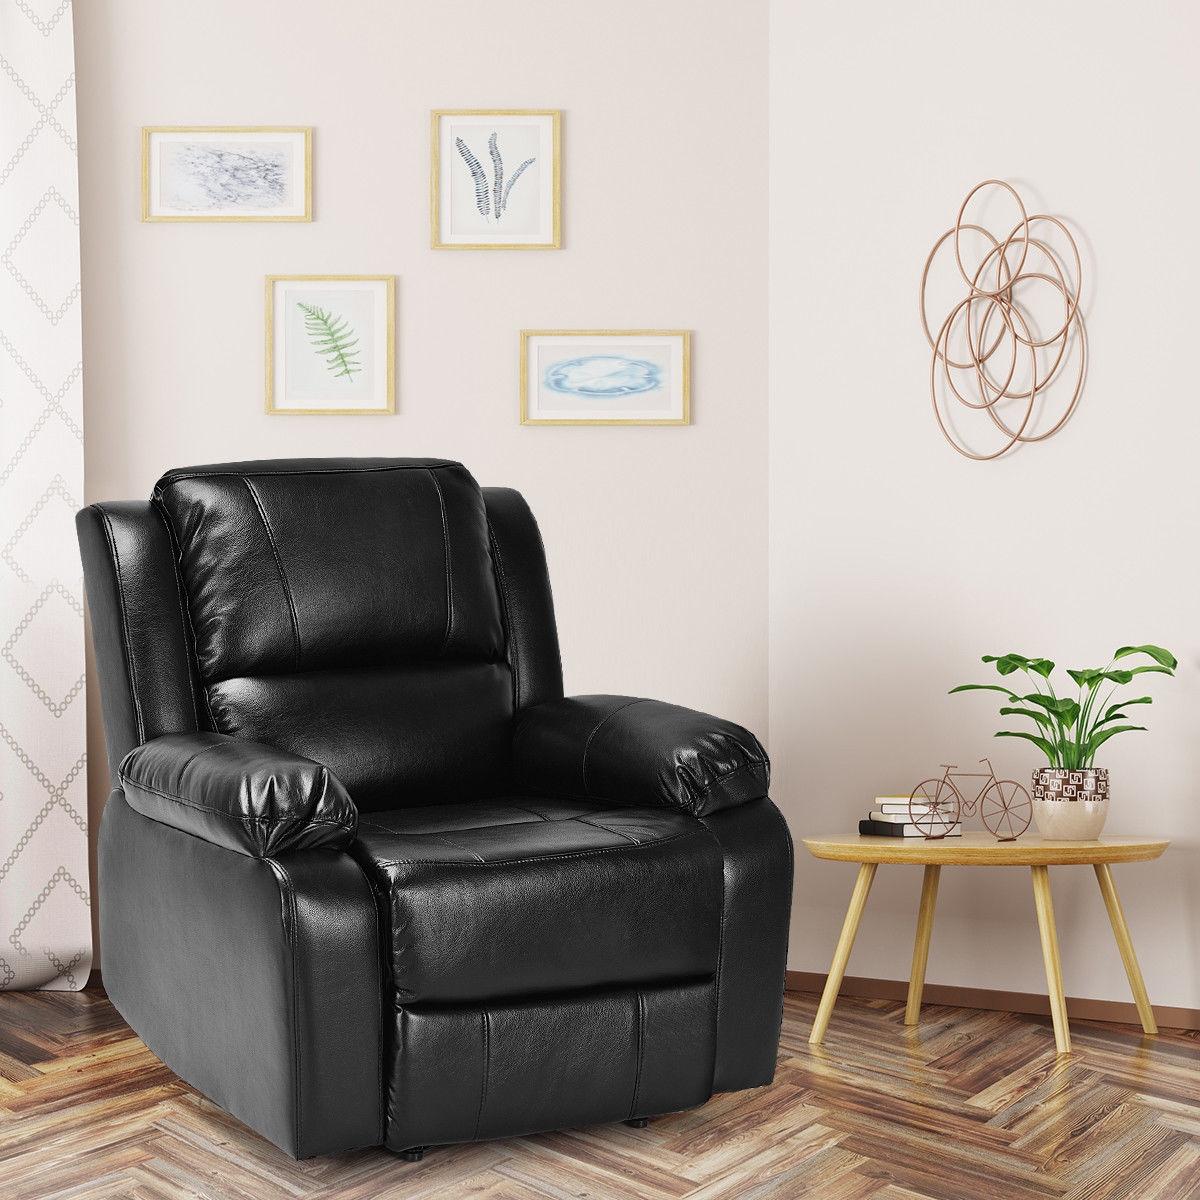 Manual Recliner PU Leather Padded Home Lounge Sofa-Black